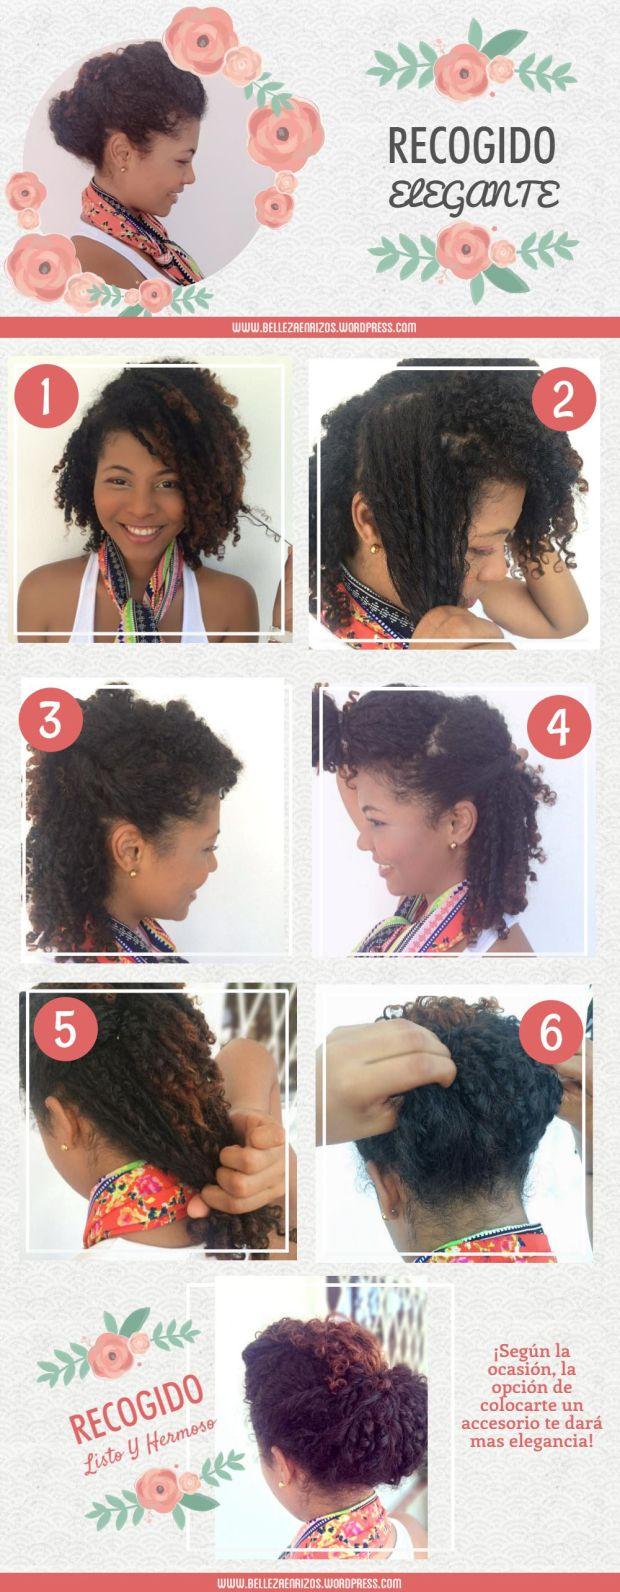 Recogido elegante | Paso a Paso  Hoy les voy a enseñar como hacer este peinado elegante con tu cabello rizado. Revisa el blog belleza en rizos para mas información.   #Peinado#Hairstyle #Rizos #Curlyhair #Pasoapaso #Recogido #Elegante #TipodePeinado #FingerCoils